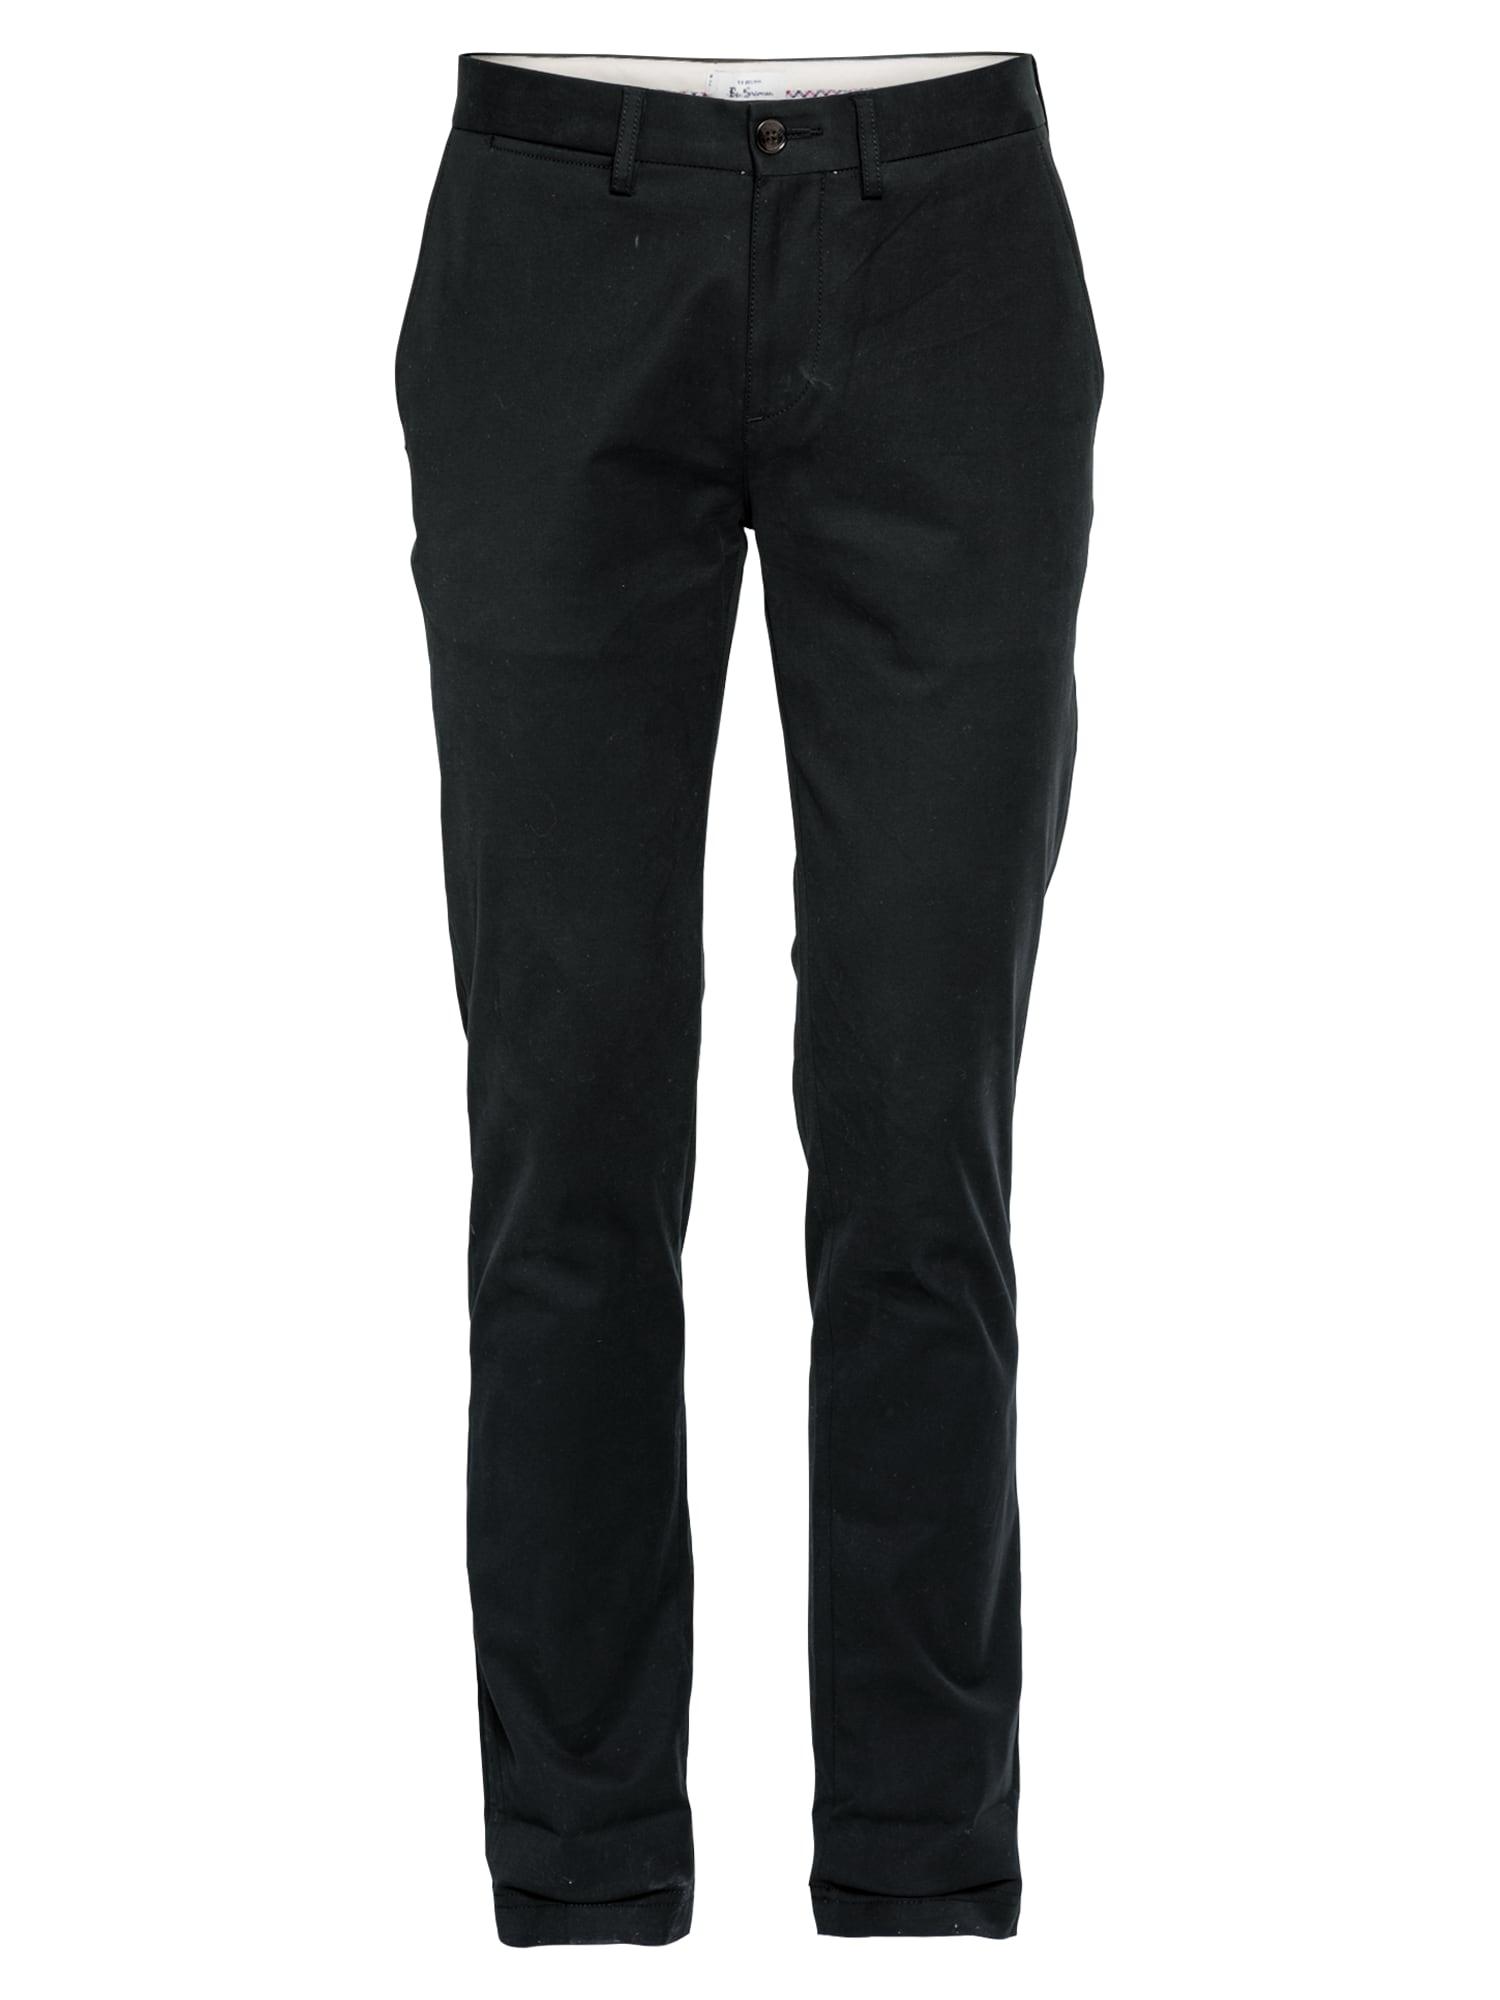 "Ben Sherman ""Chino"" stiliaus kelnės juoda"